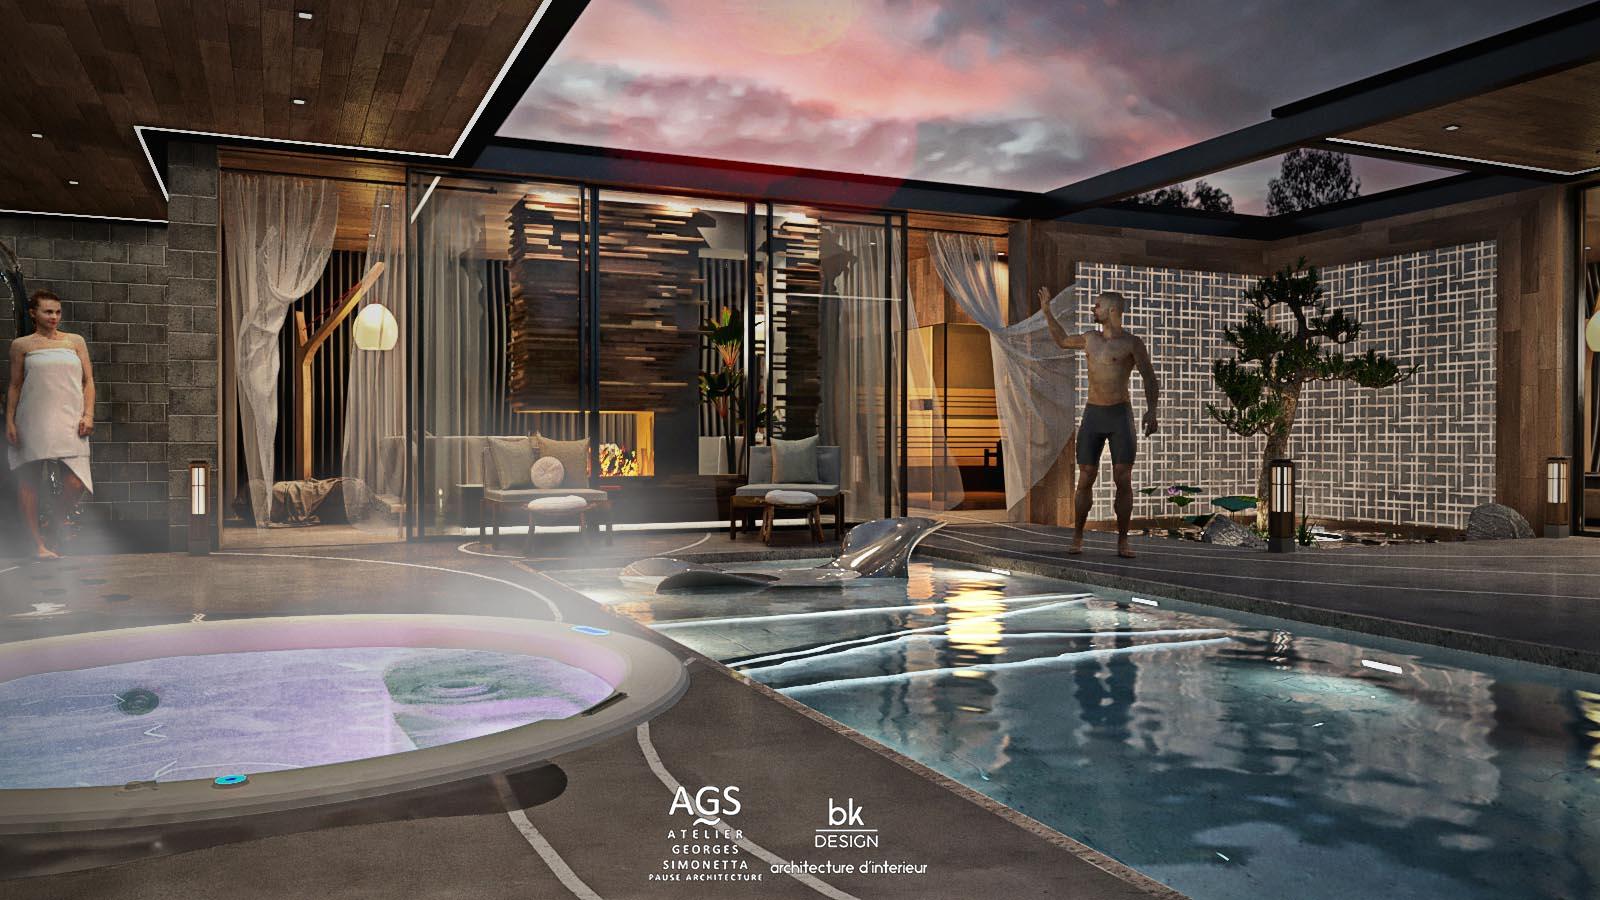 10 bk Design Projet Chalet Vosges